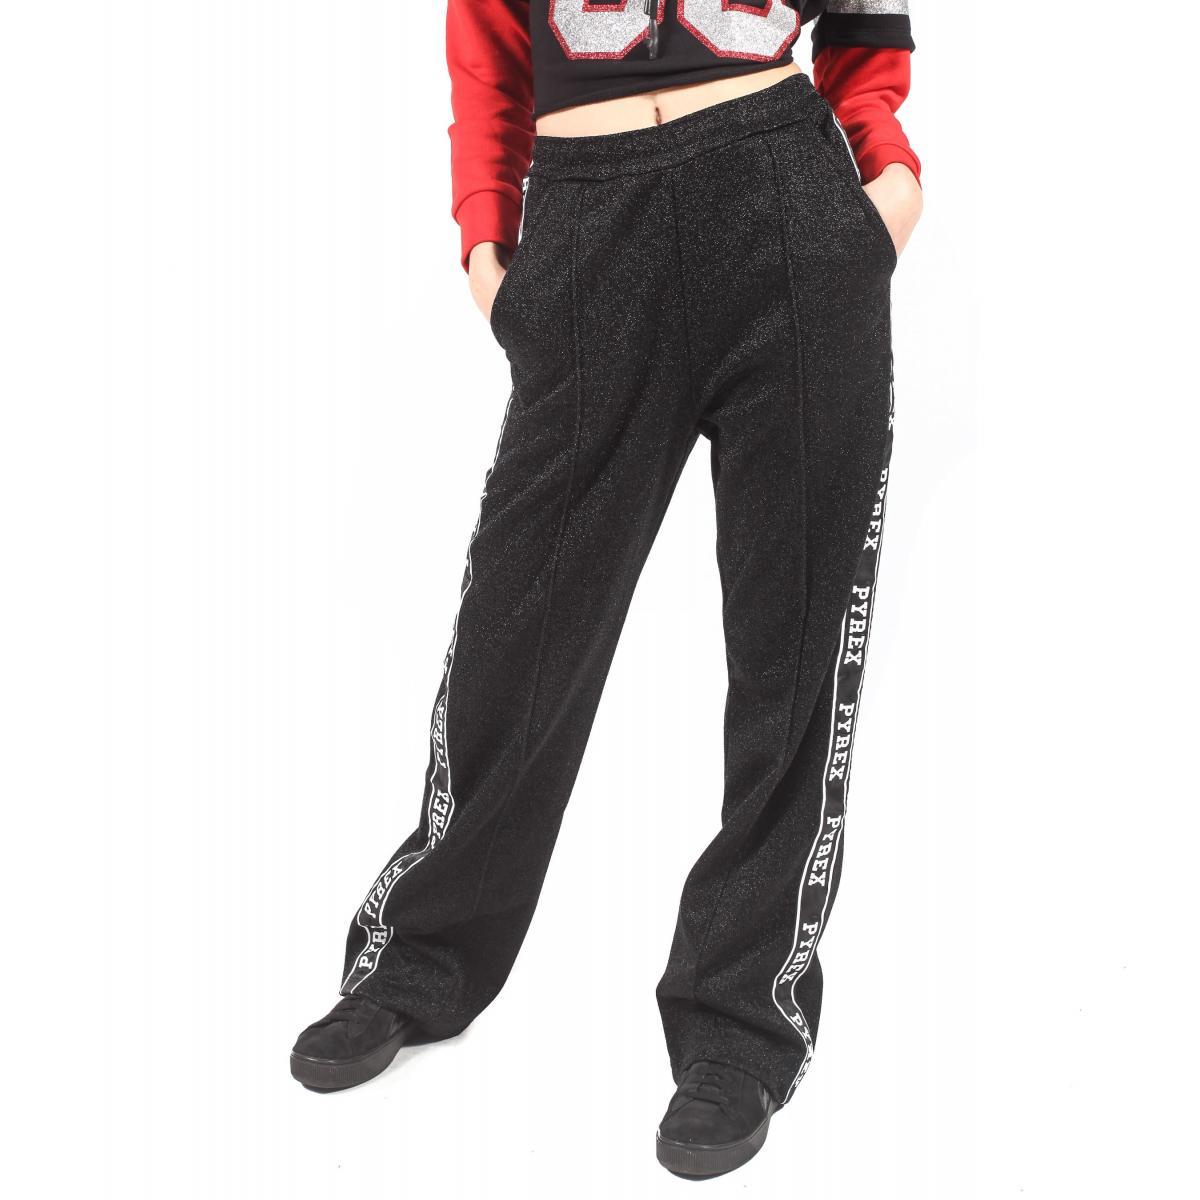 Pantalone Pyrex da donna con fondo largo rif. 18IPC34514